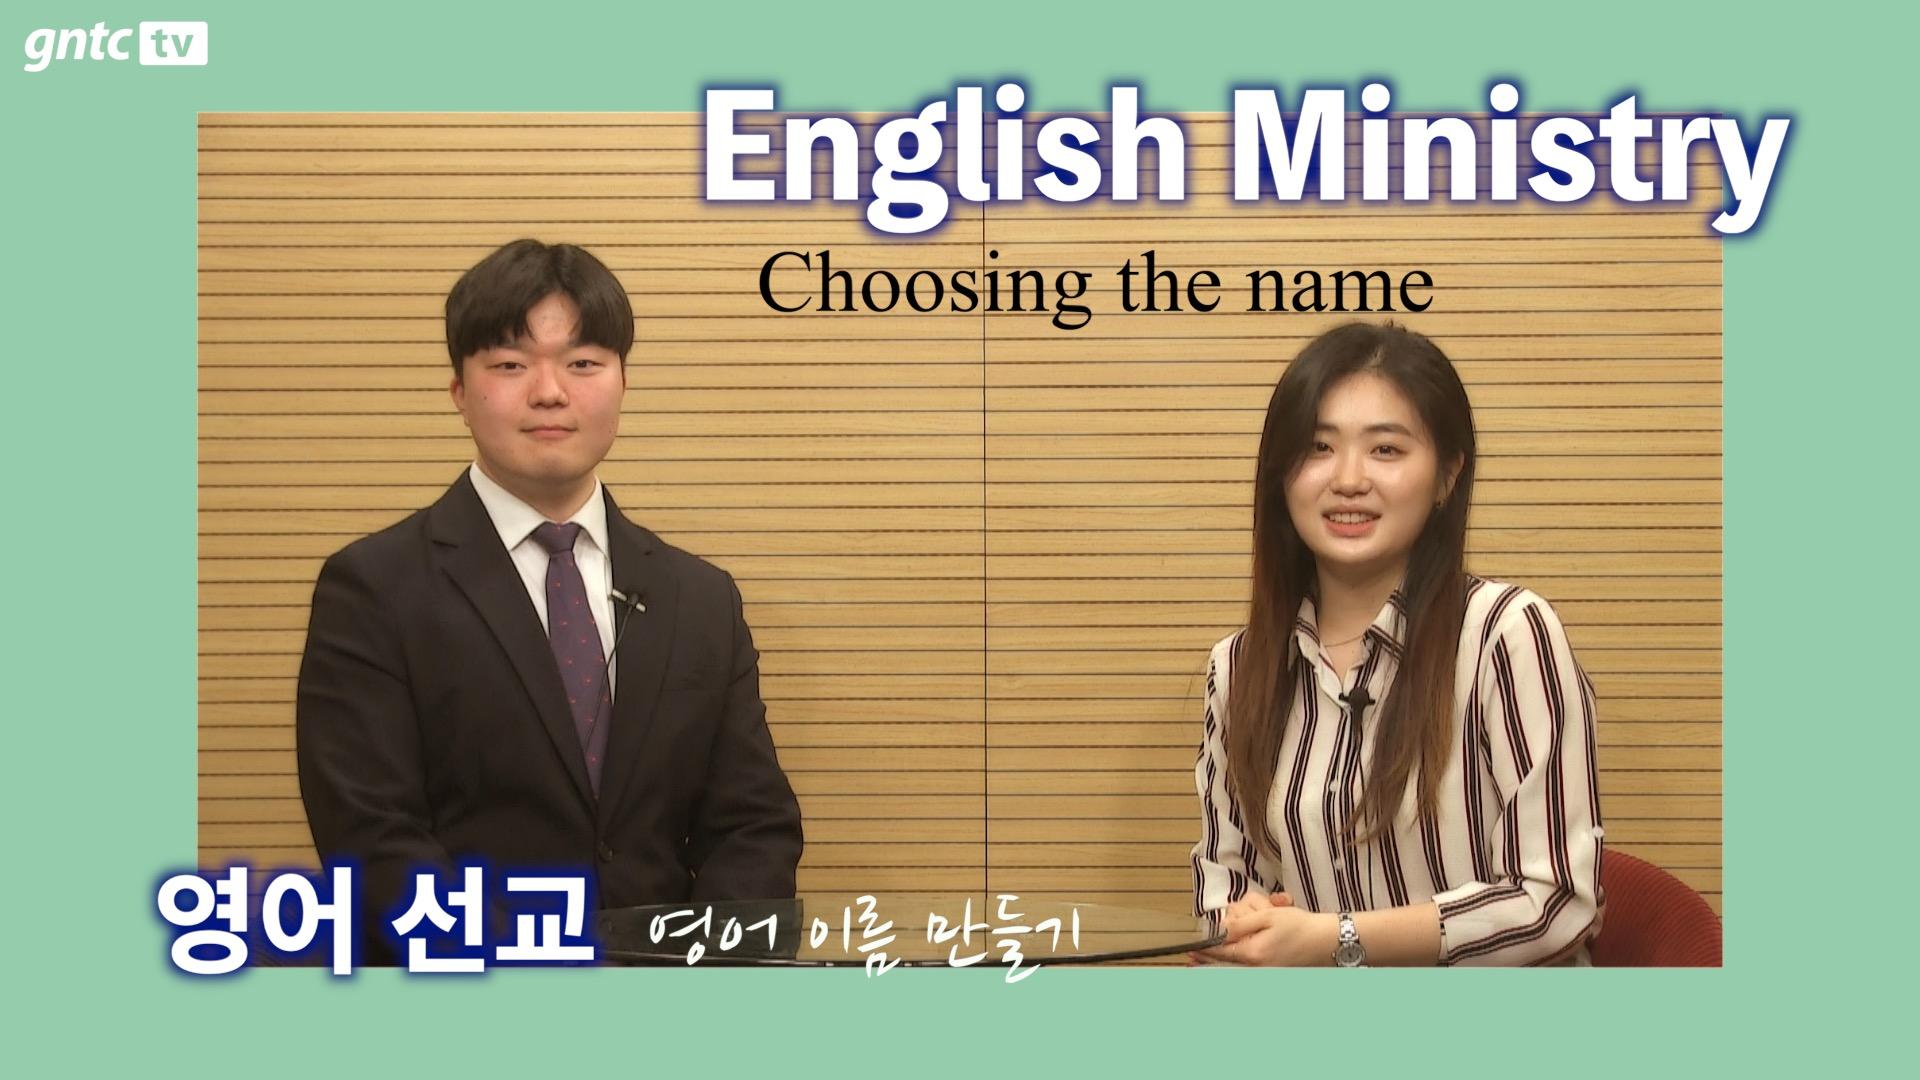 Leena's Bible English-English Ministry Choosing English Names